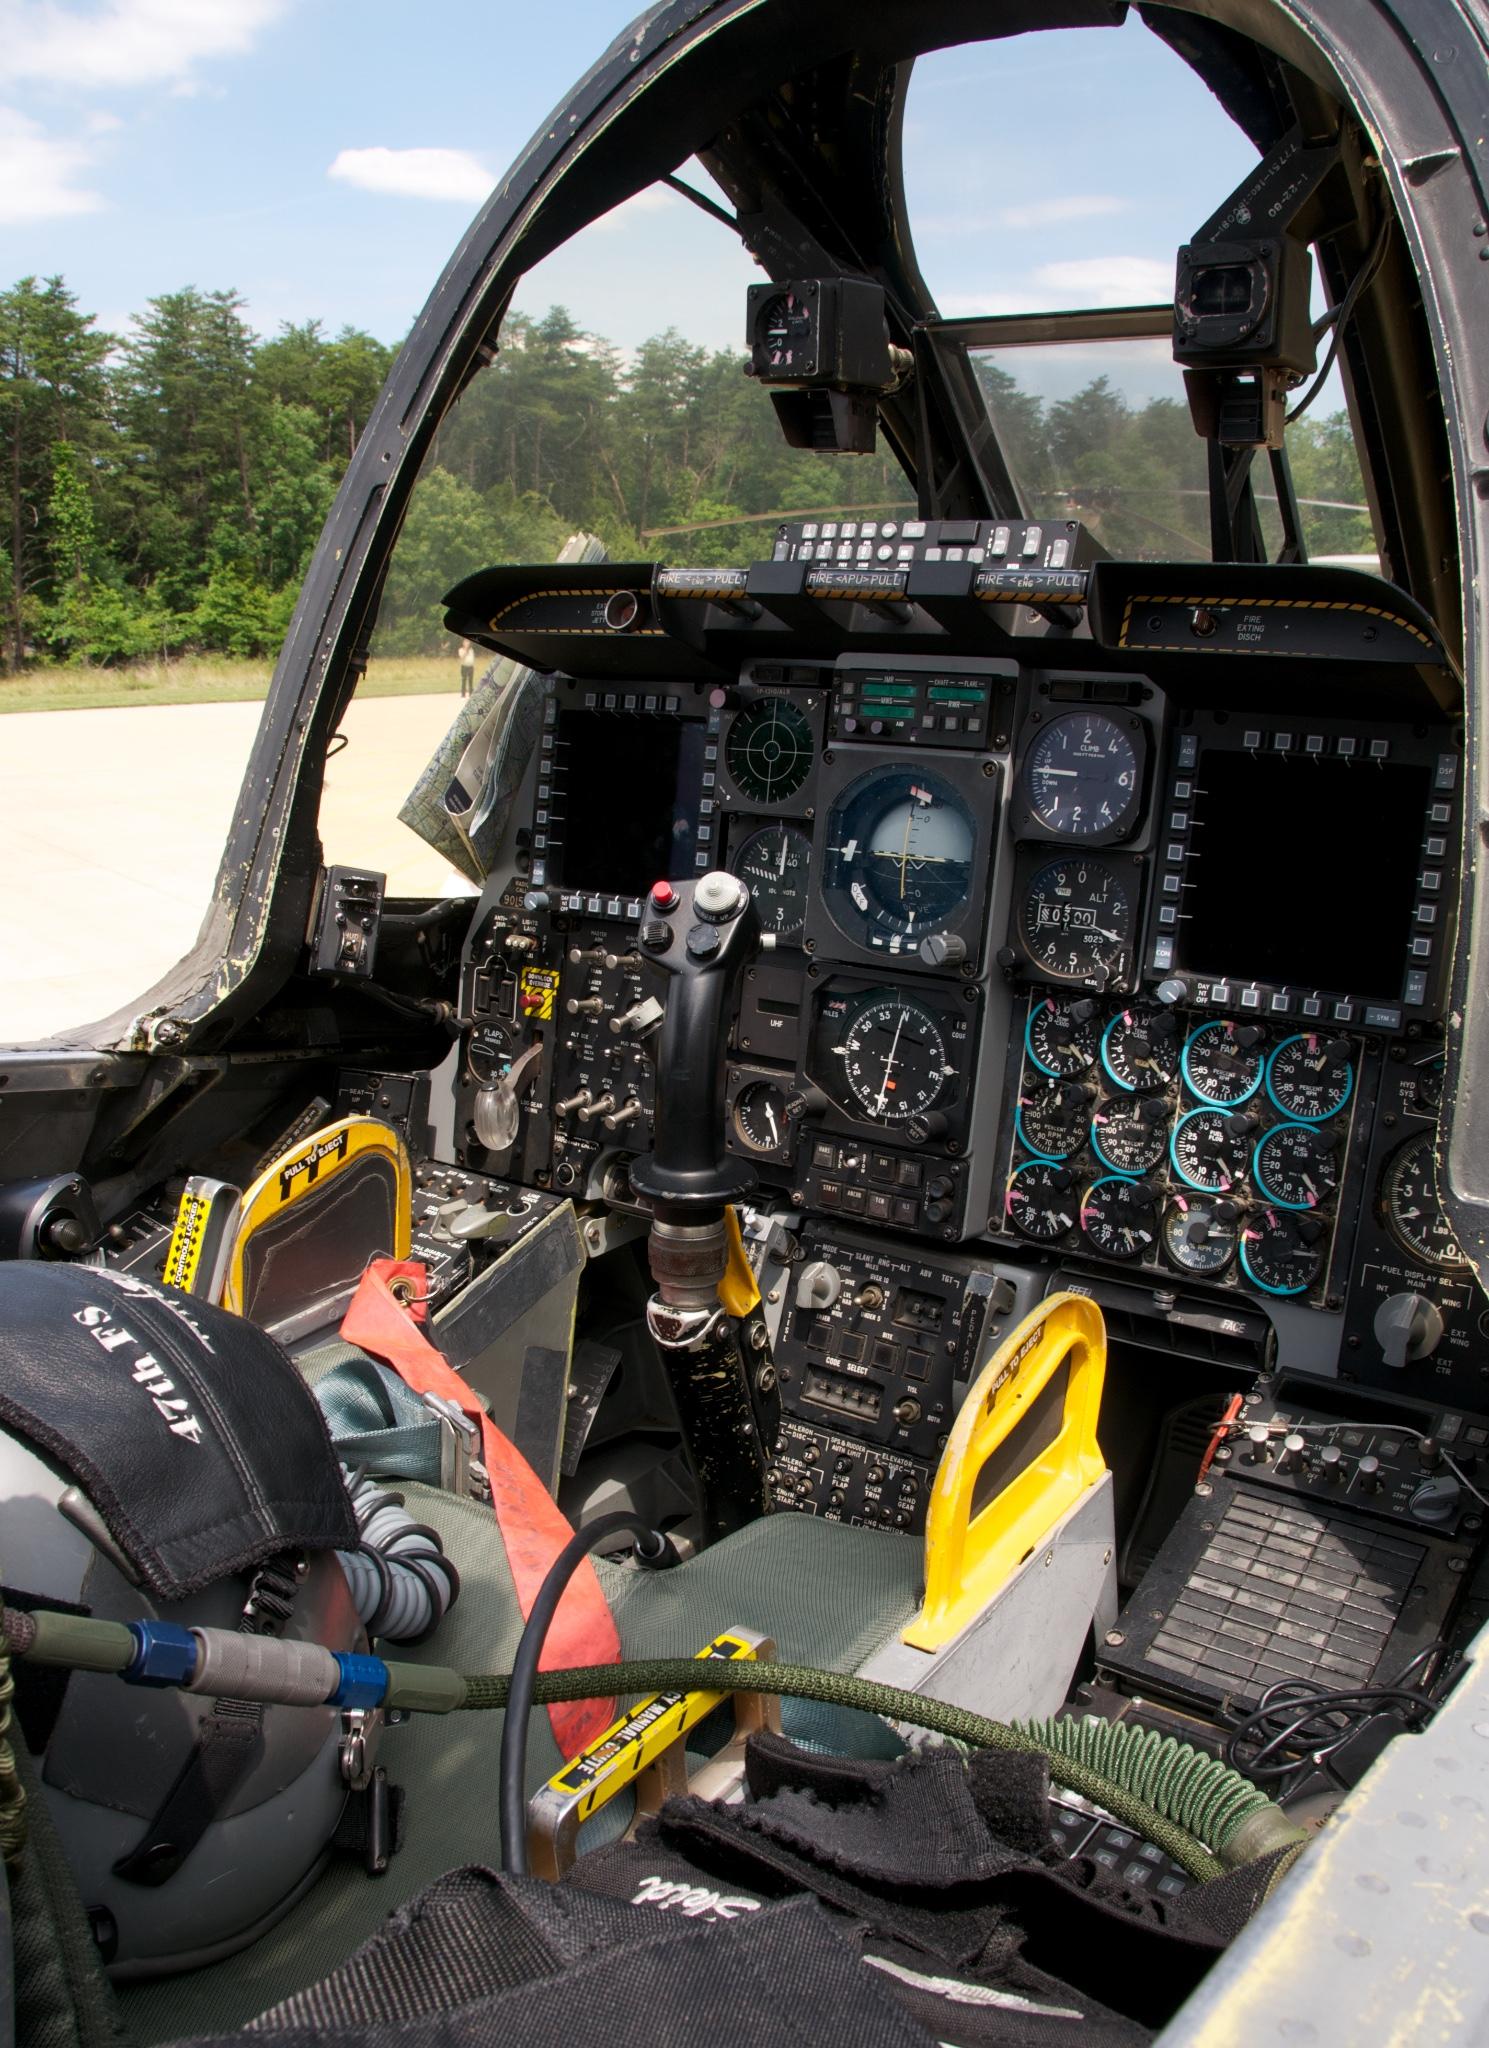 File:A-10C Warthog Cockpit.jpg - Wikimedia Commons